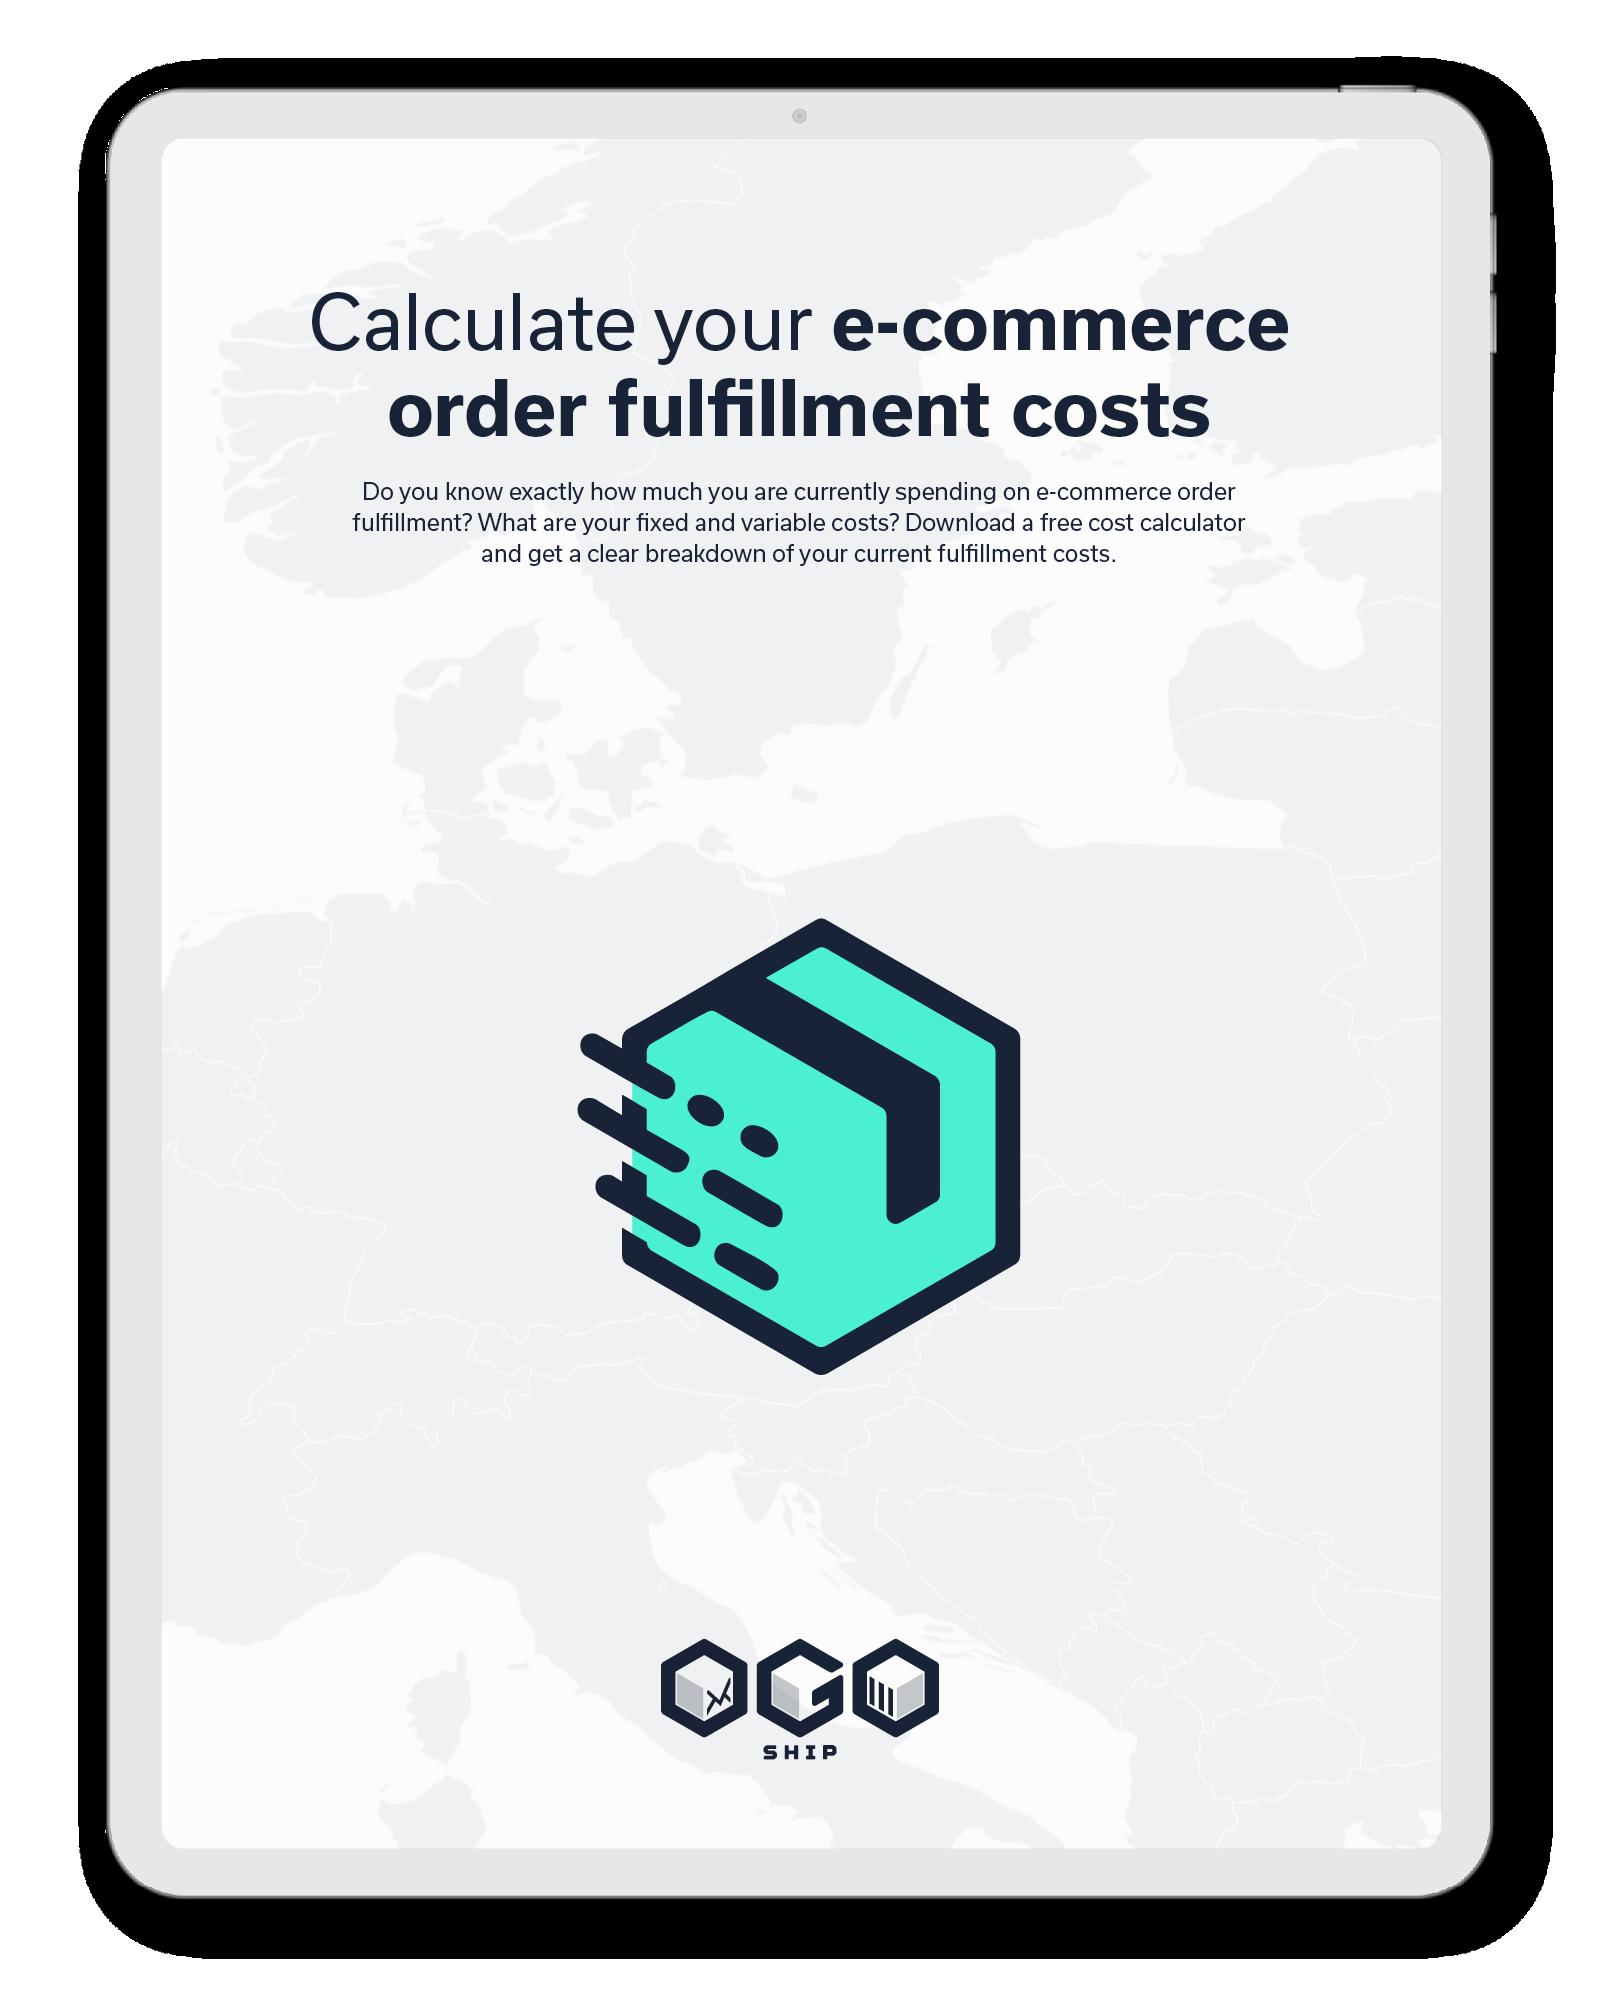 ogoship-ecommerce-order-fulfillment-calculator